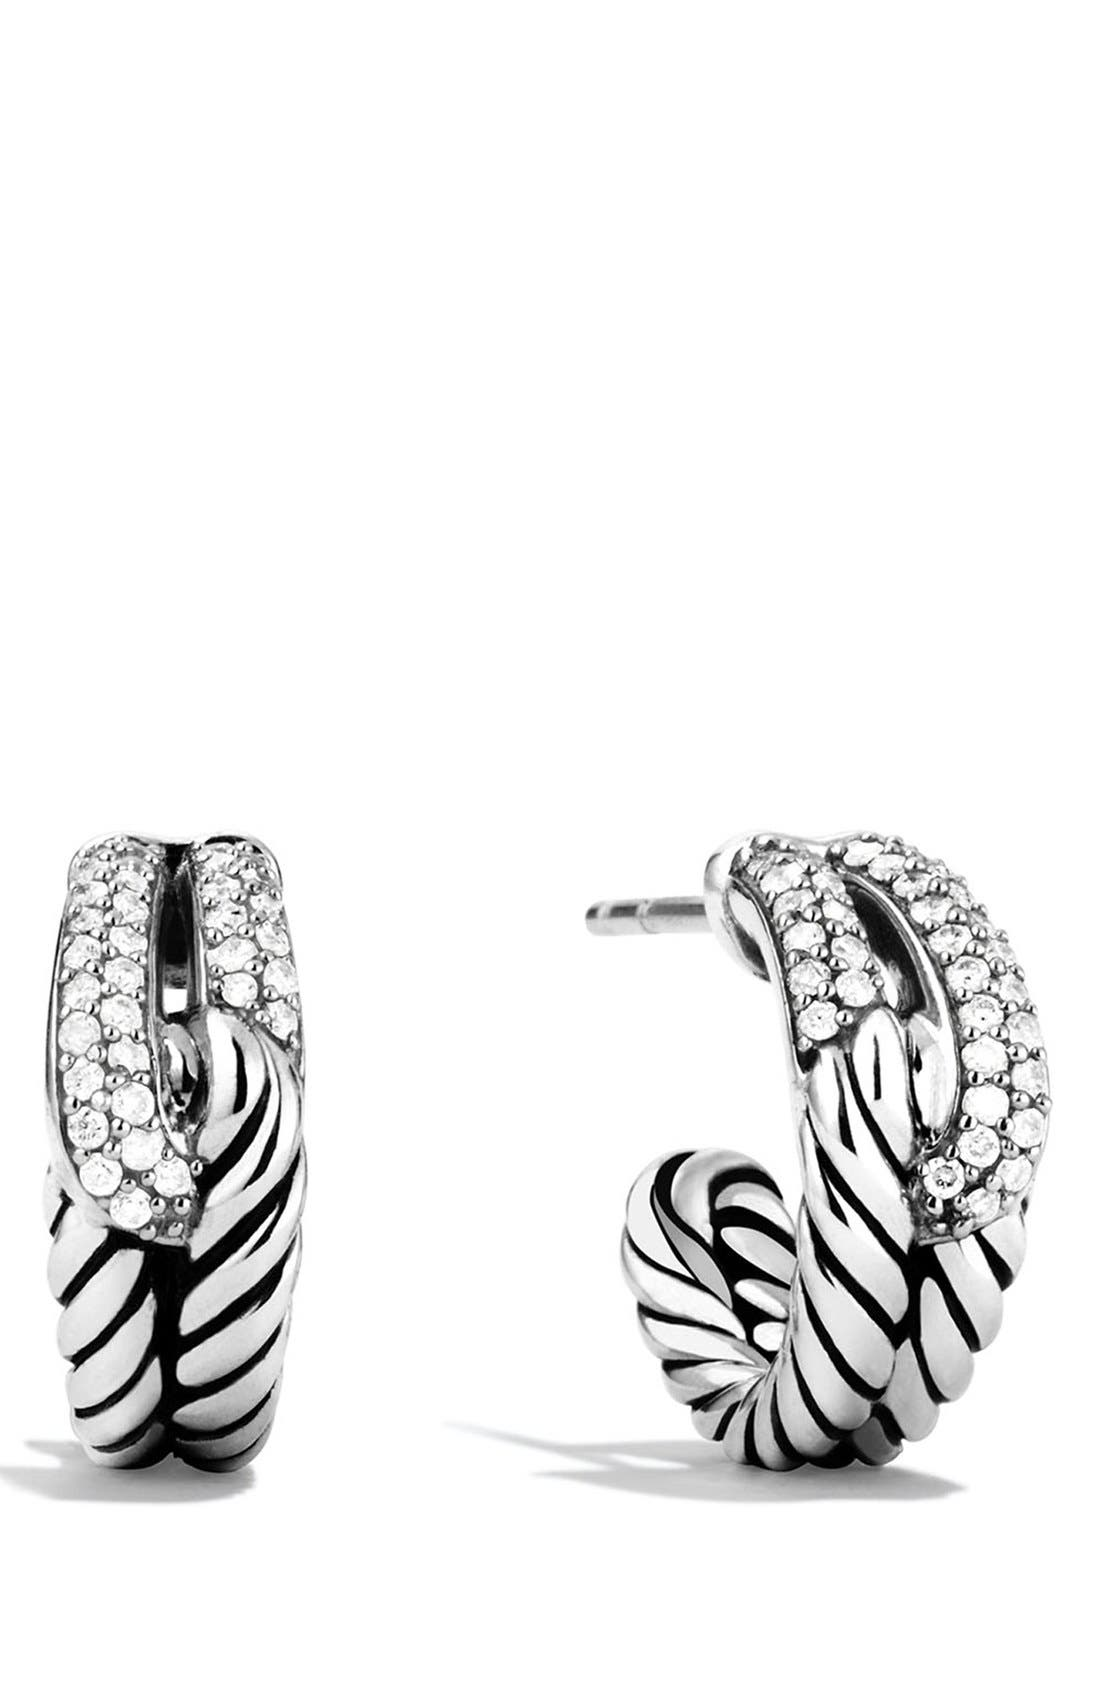 David Yurman 'Labyrinth' Single Loop Earrings with Diamonds